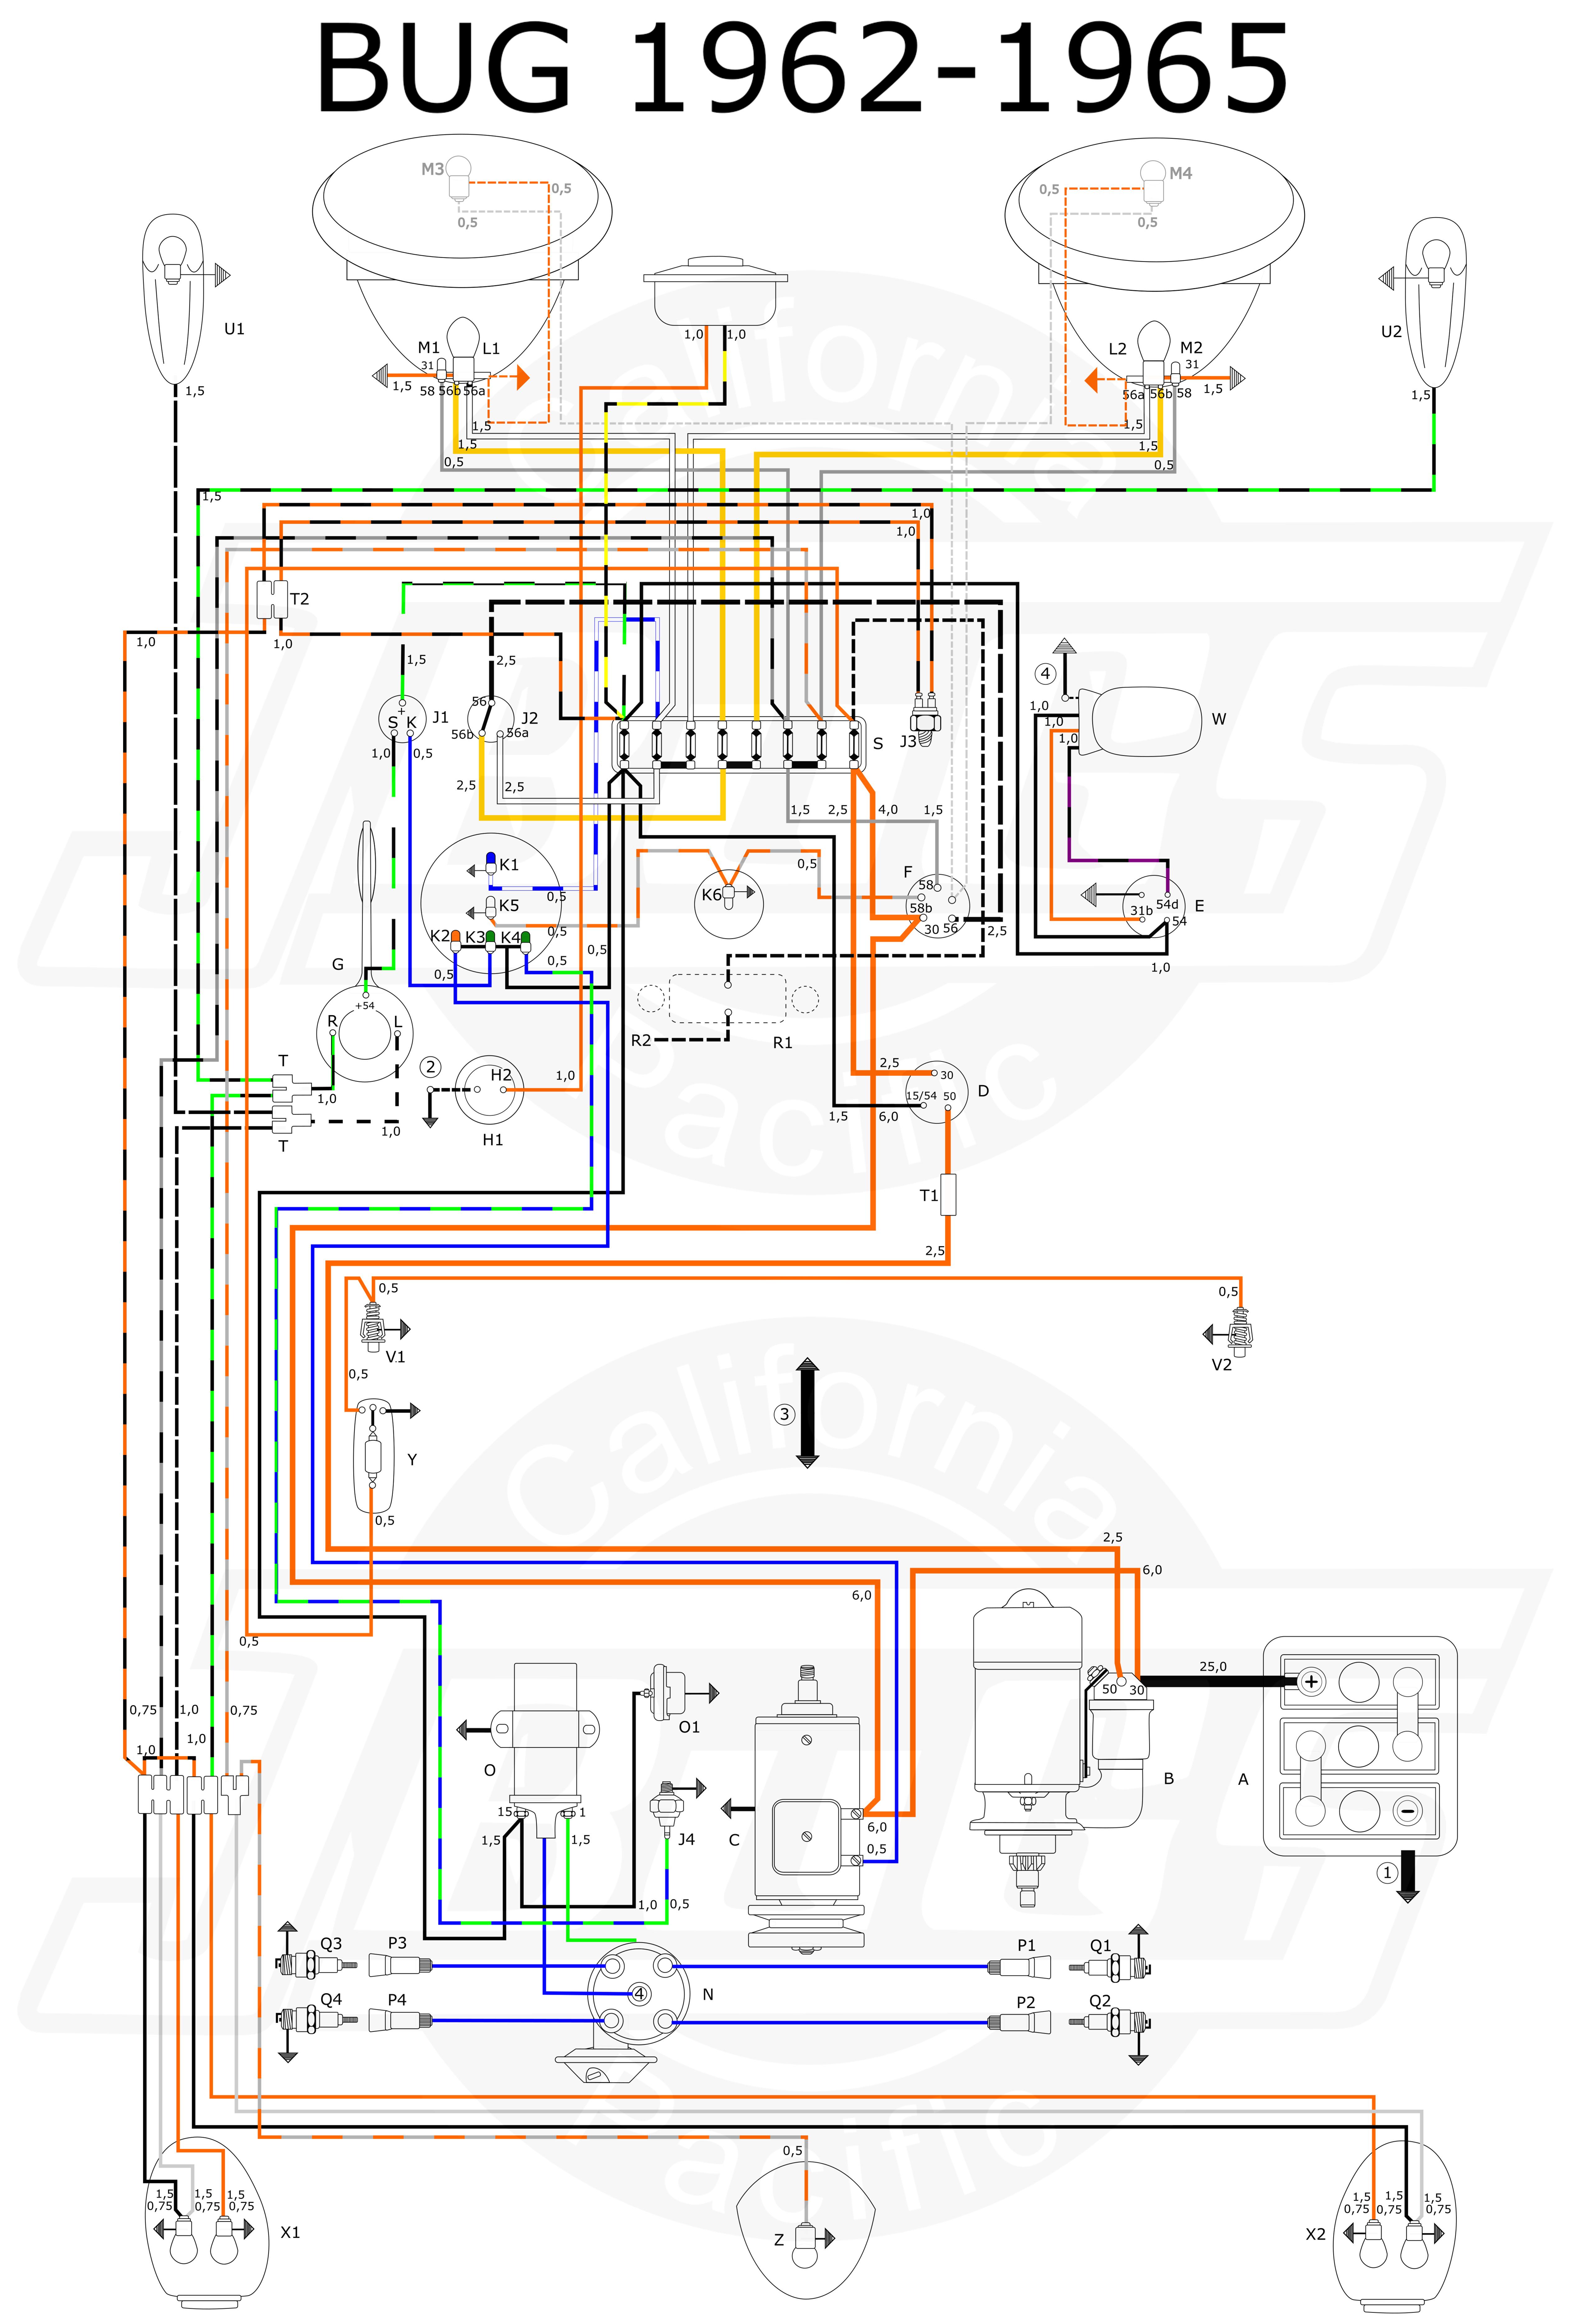 1991 Gm 7500 Starter Wiring Diagram Libraries Craftsman Model 917 273820 For Professional U20221991